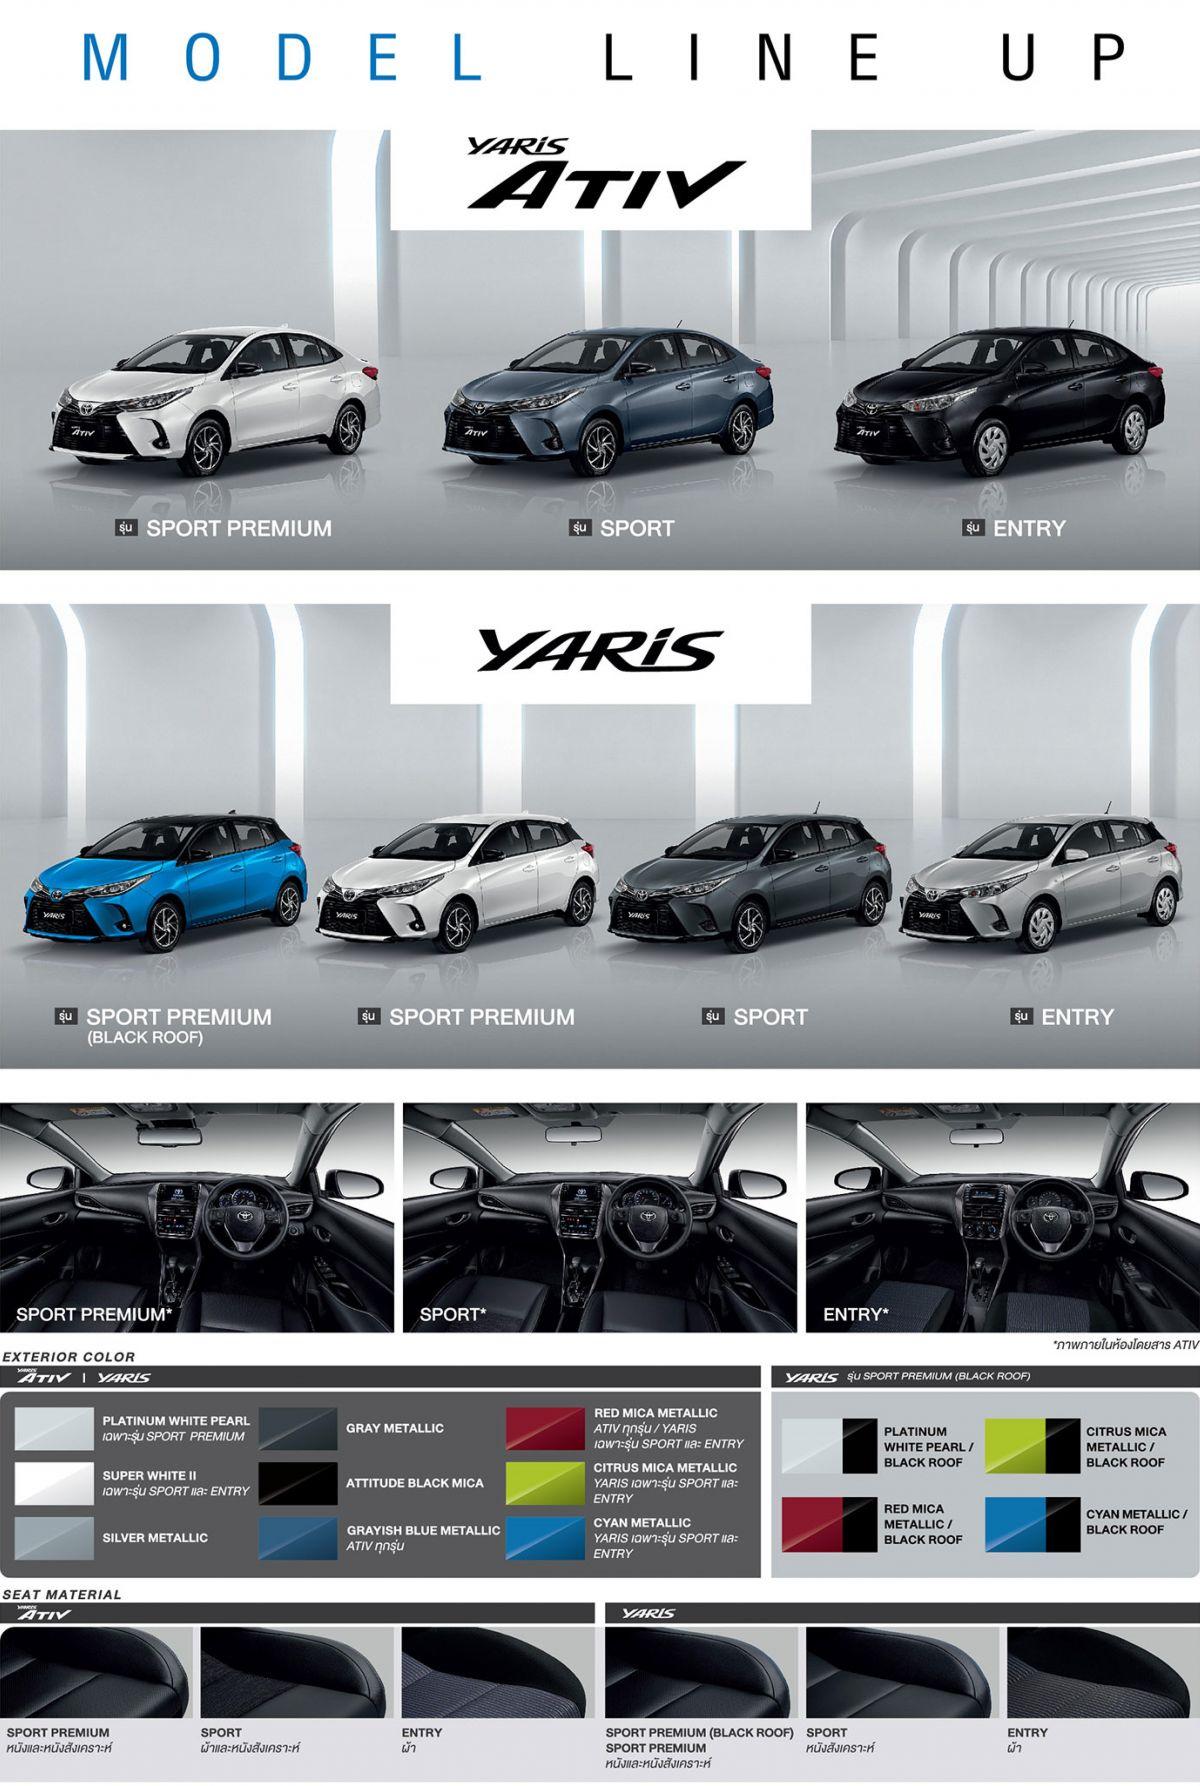 2020-Toyota-Yaris-Yaris-Ativ-facelift-line-up-1-1200x1786.jpg